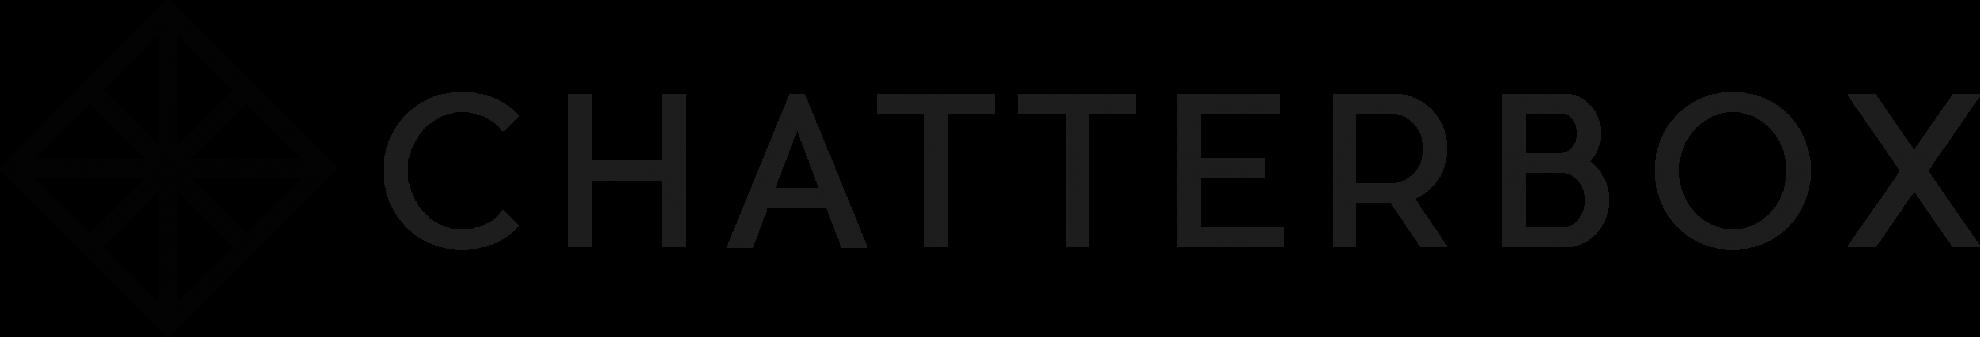 Chatterbox [logo]